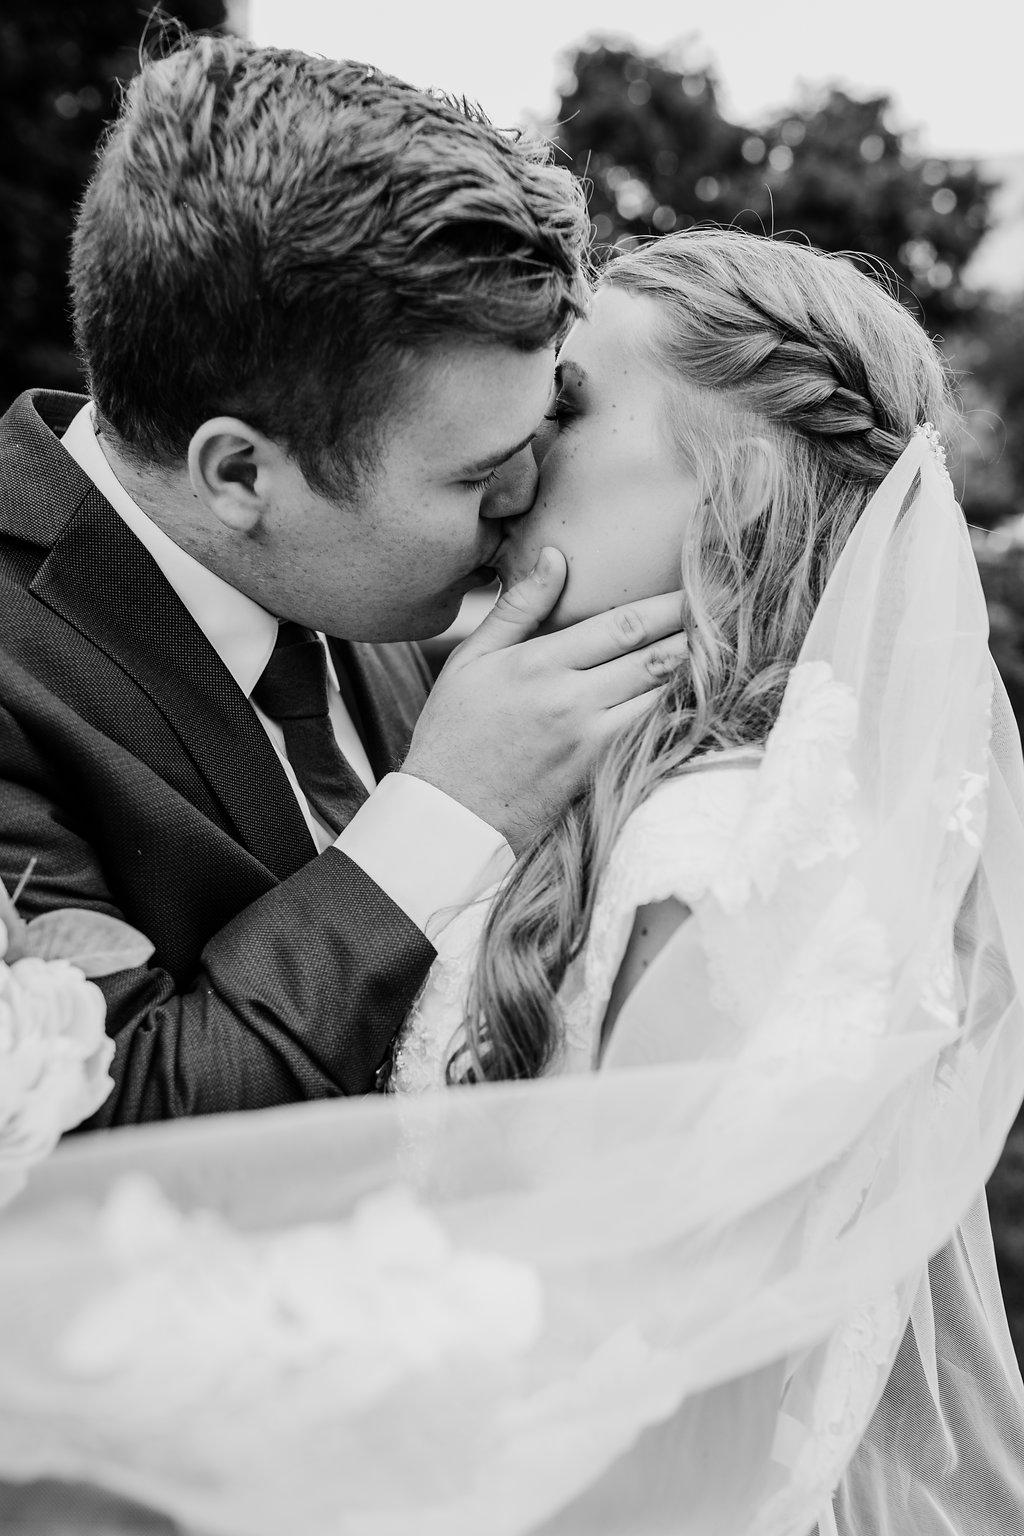 lds wedding gown wedding photography salt lake city utah black and white veil shot